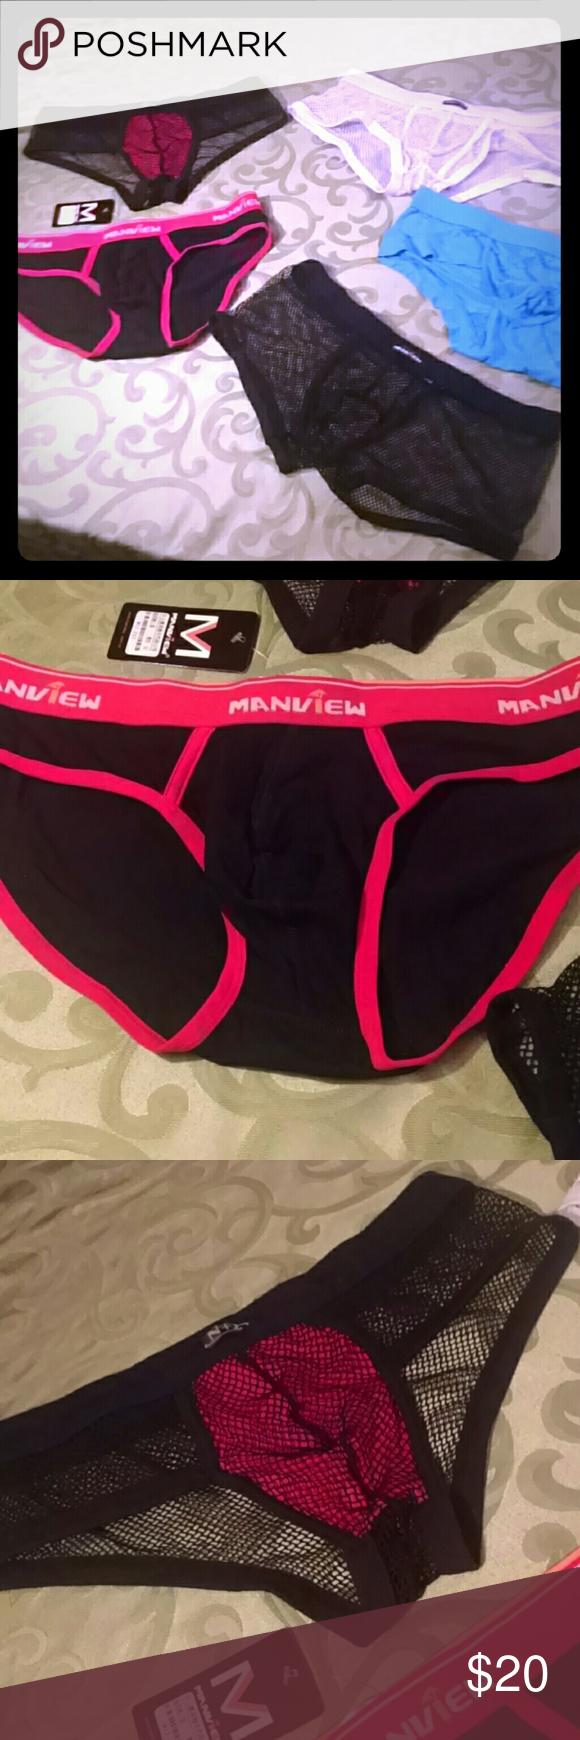 597158752 5 pair XL Mens sexy underwear 1NWT 4NWOT Several pair of sexy men s undies.  NWT